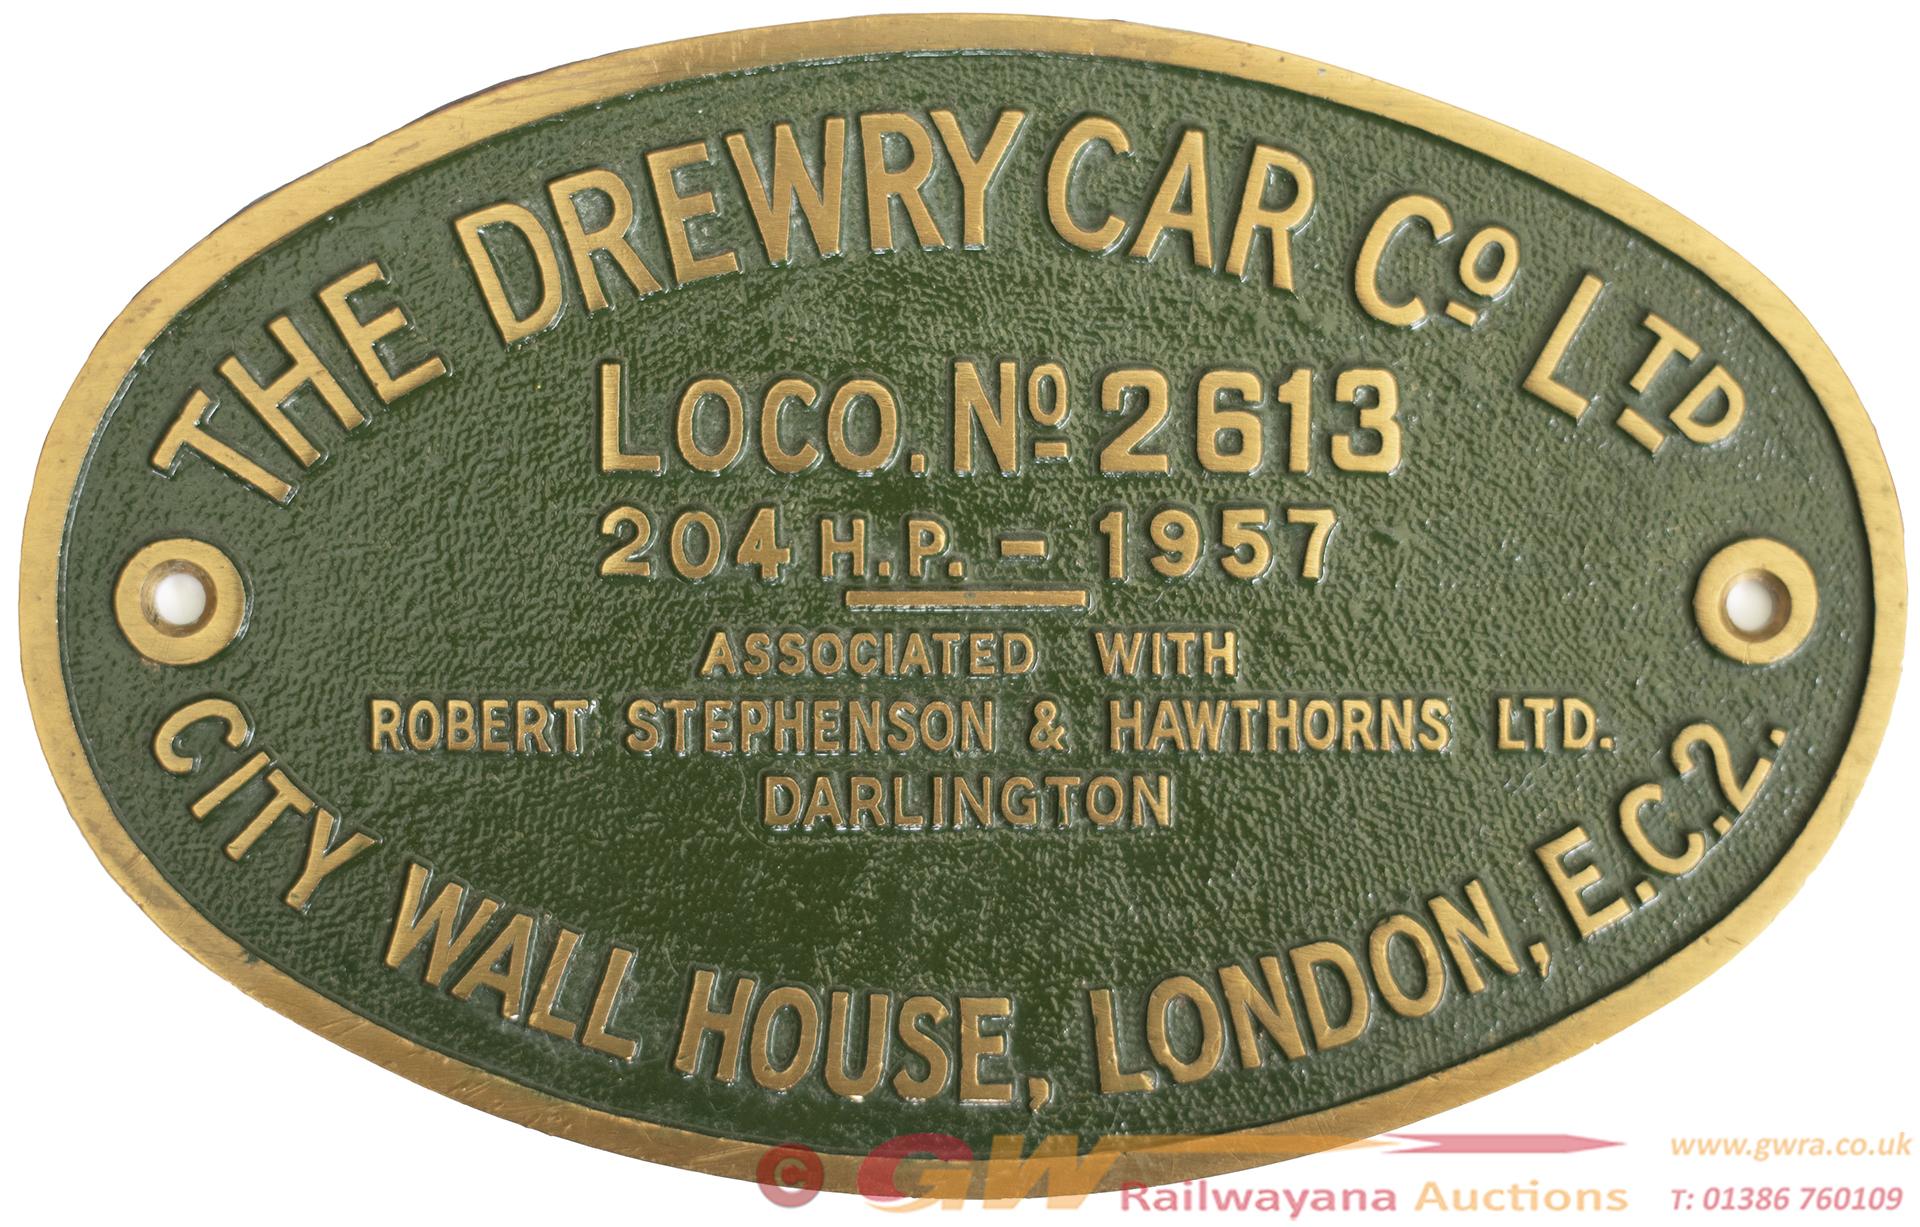 Worksplate 'THE DREWRY CAR CO LTD CITY WALL HOUSE,